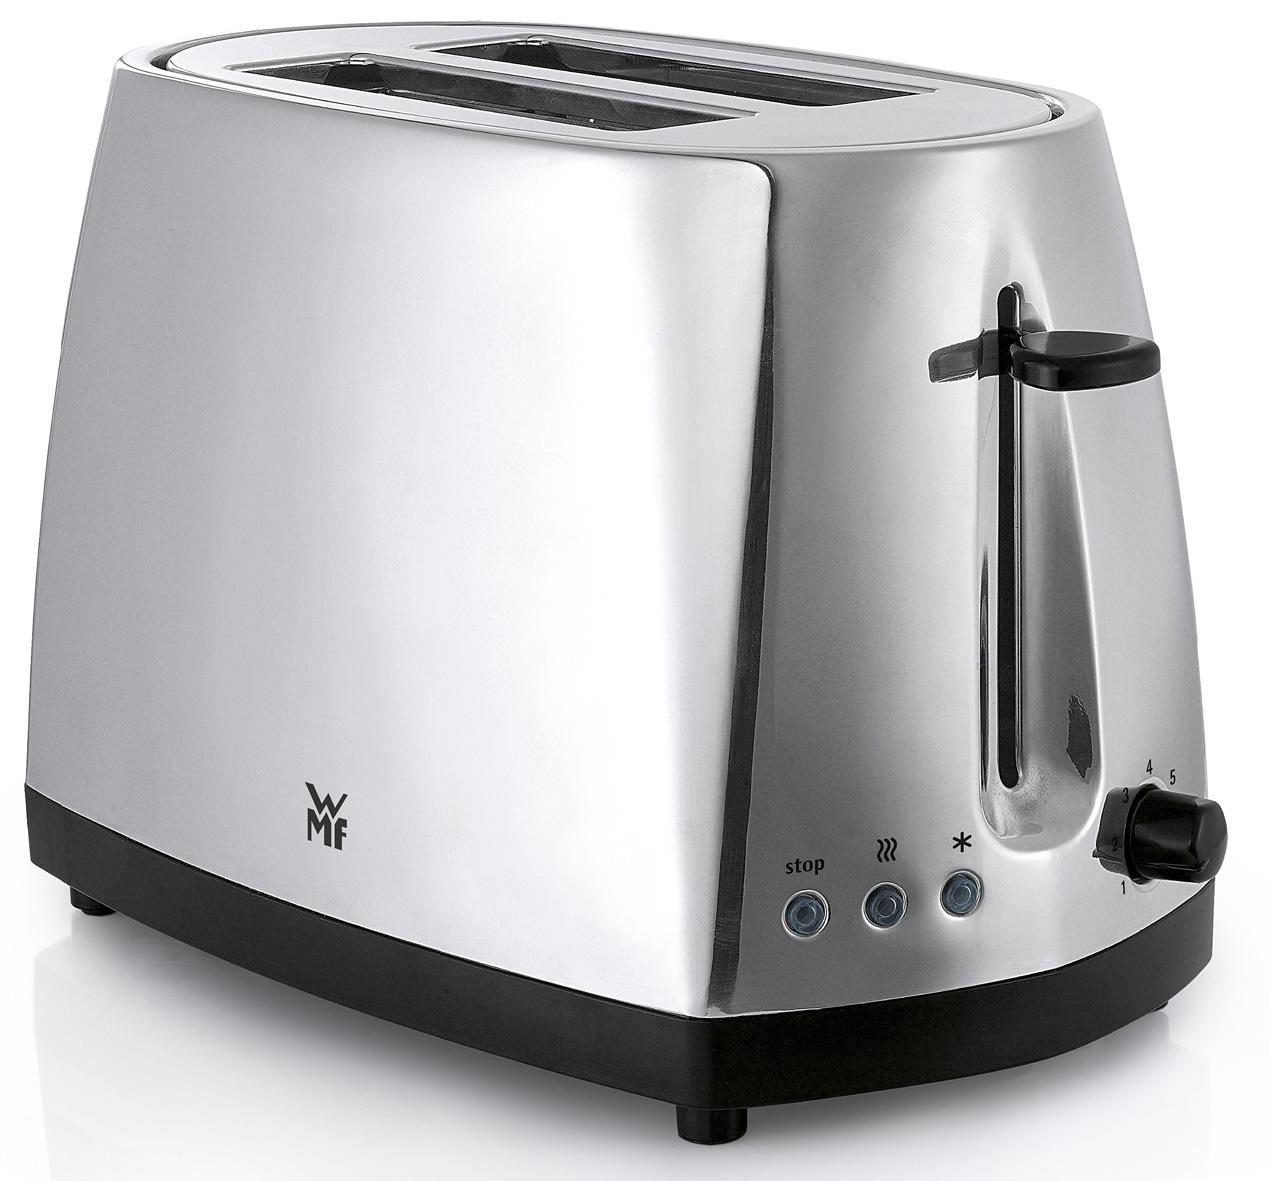 wmf skyline toaster reduziertes design mit hoher. Black Bedroom Furniture Sets. Home Design Ideas